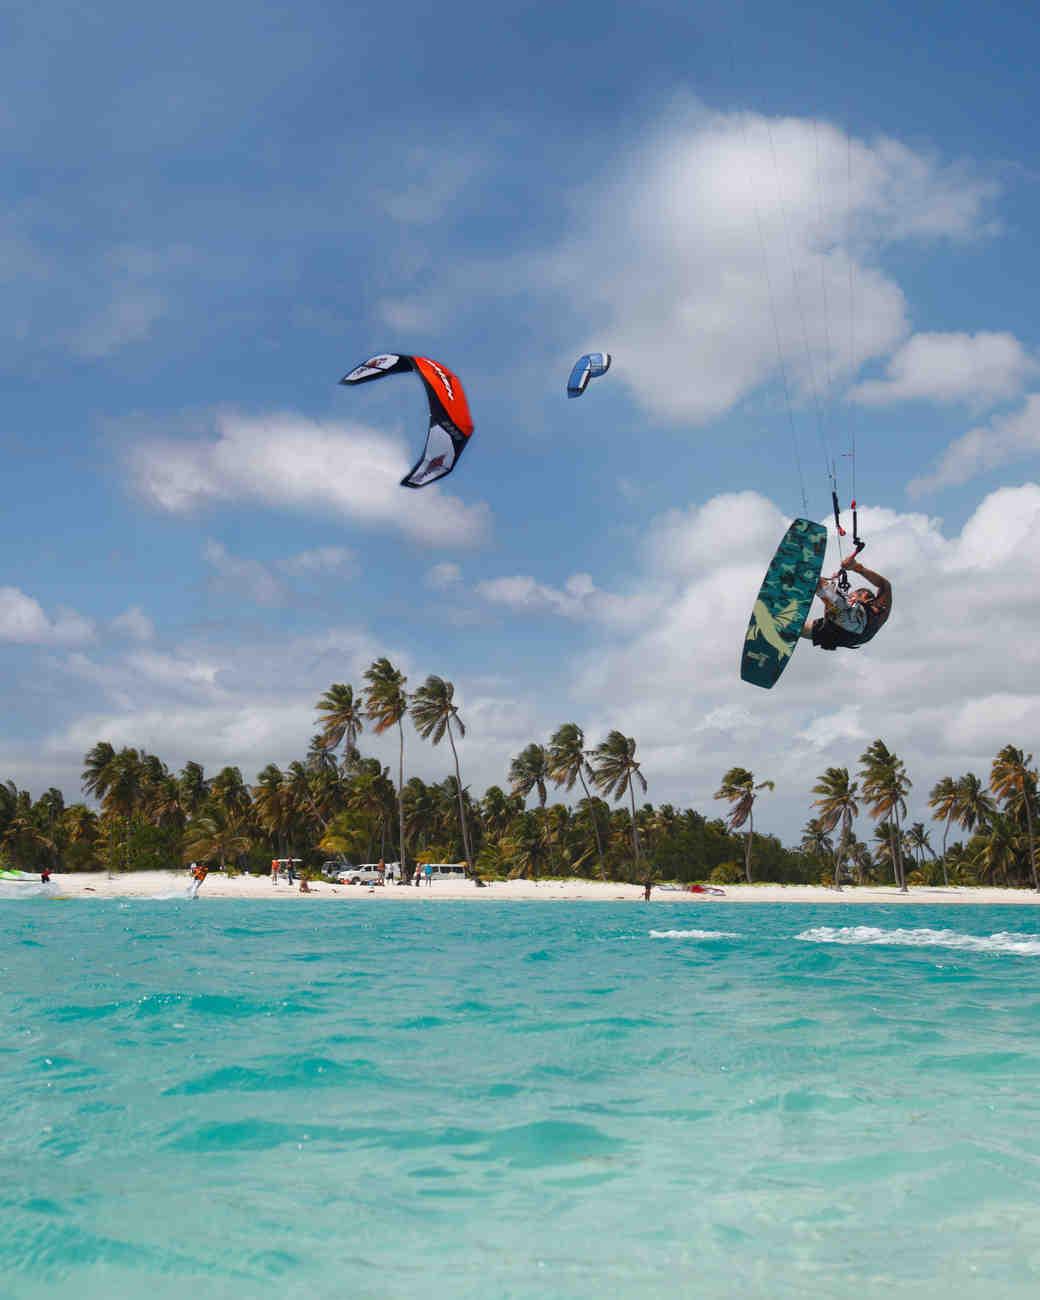 caribbean-kiteboarding-playa-encuentro-dominican-republic-0315.jpg